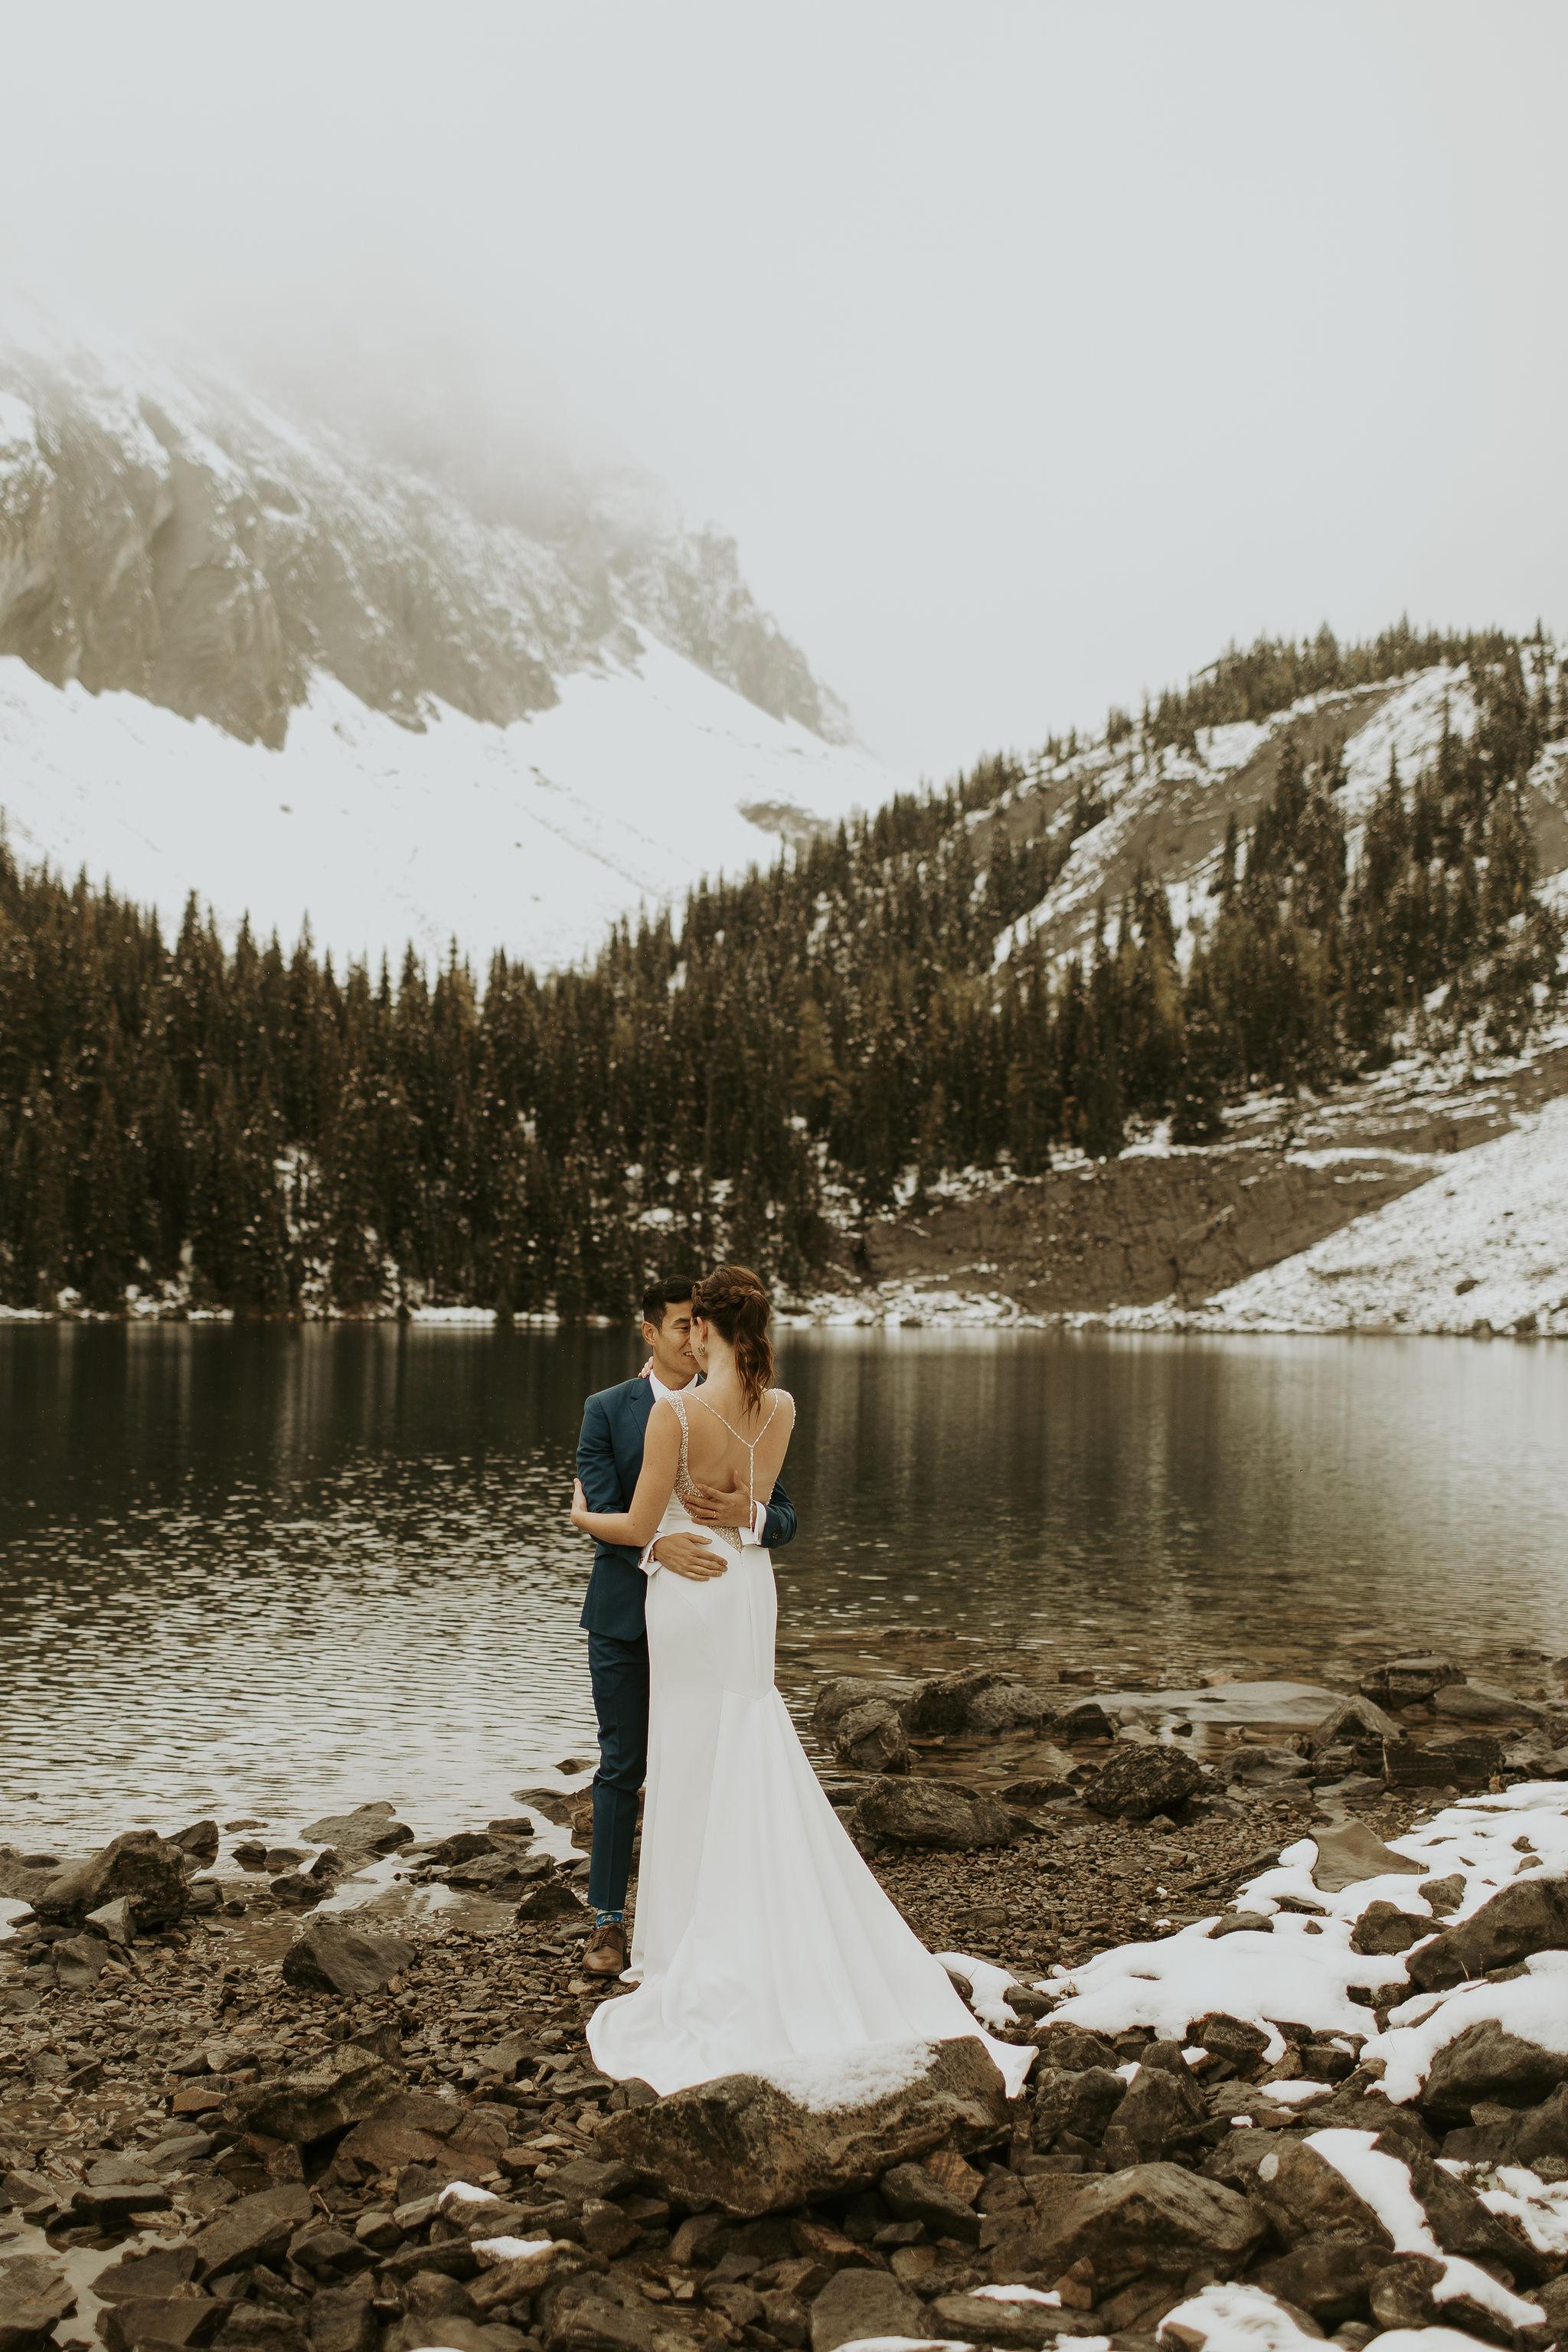 AK_Wedding_MountainPortraits-21.jpg